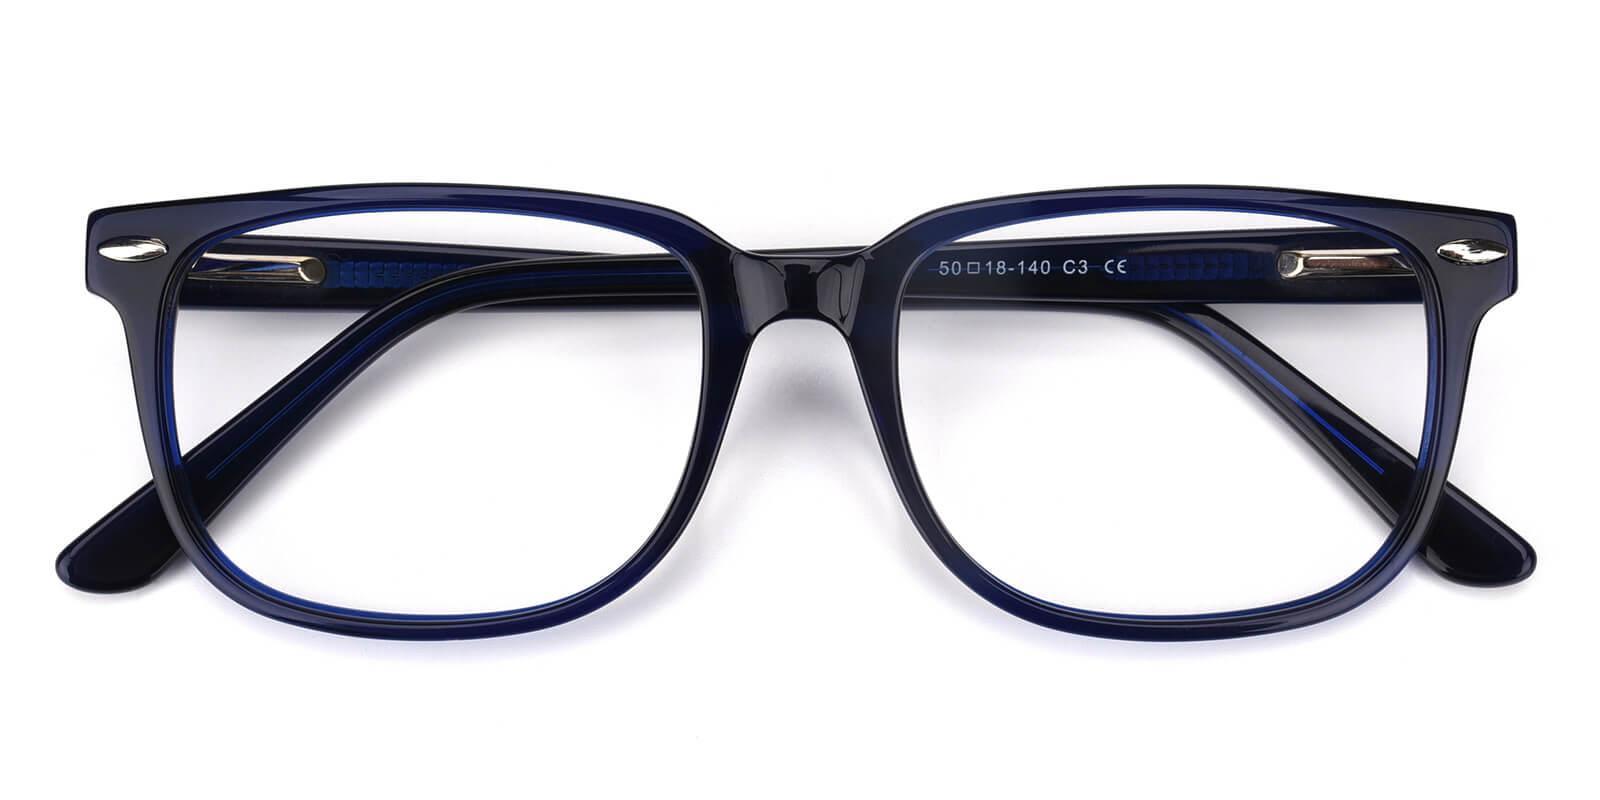 Tempiry-Blue-Rectangle-Acetate-Eyeglasses-detail